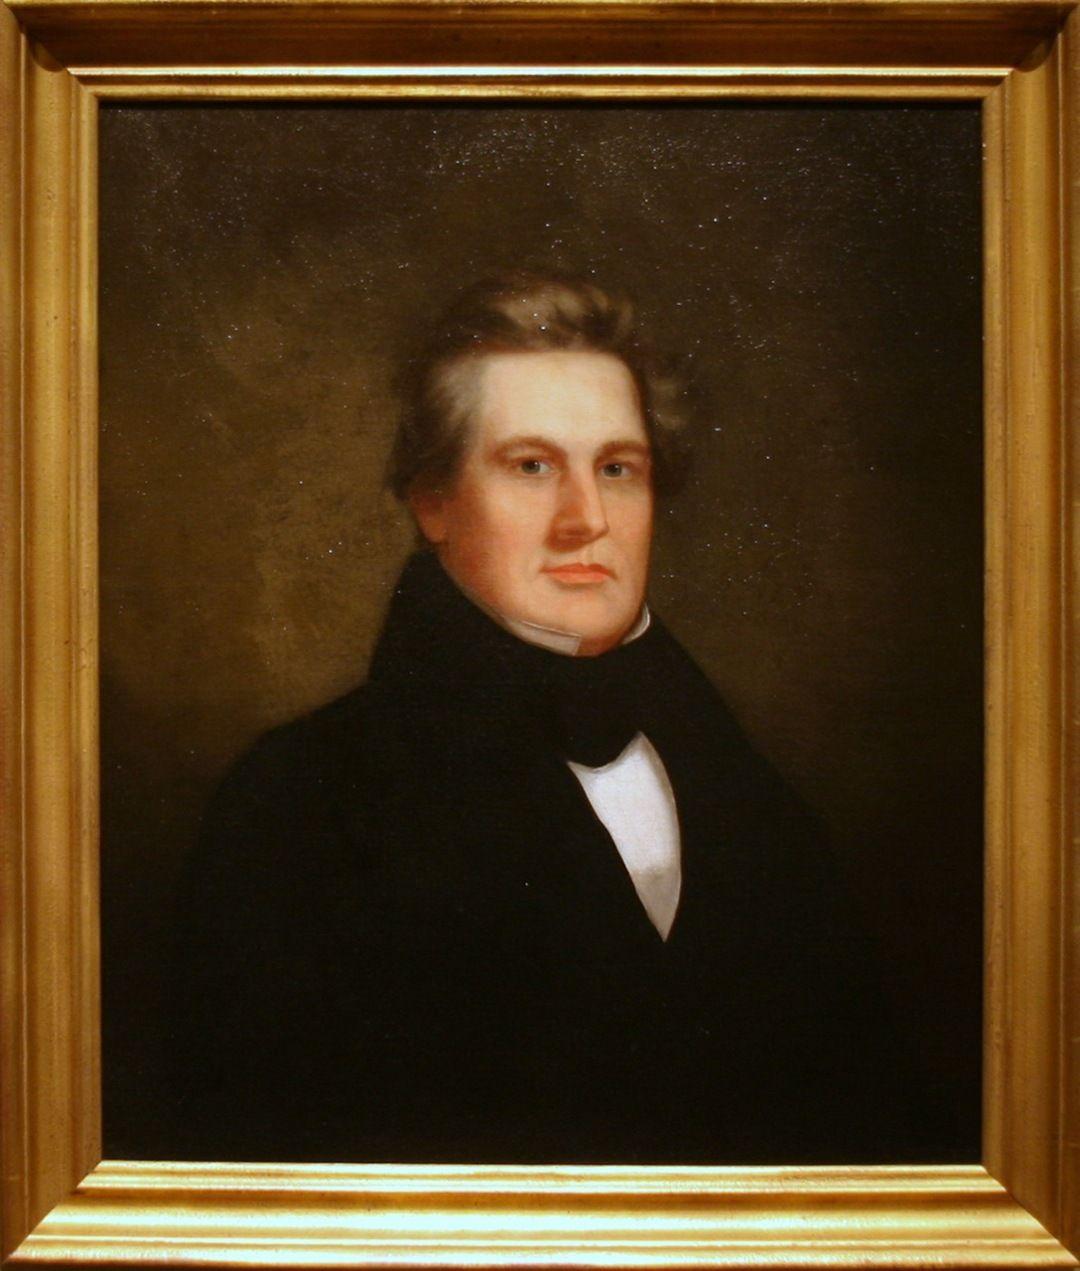 A young Millard Fillmore 13 Mr. President Millard